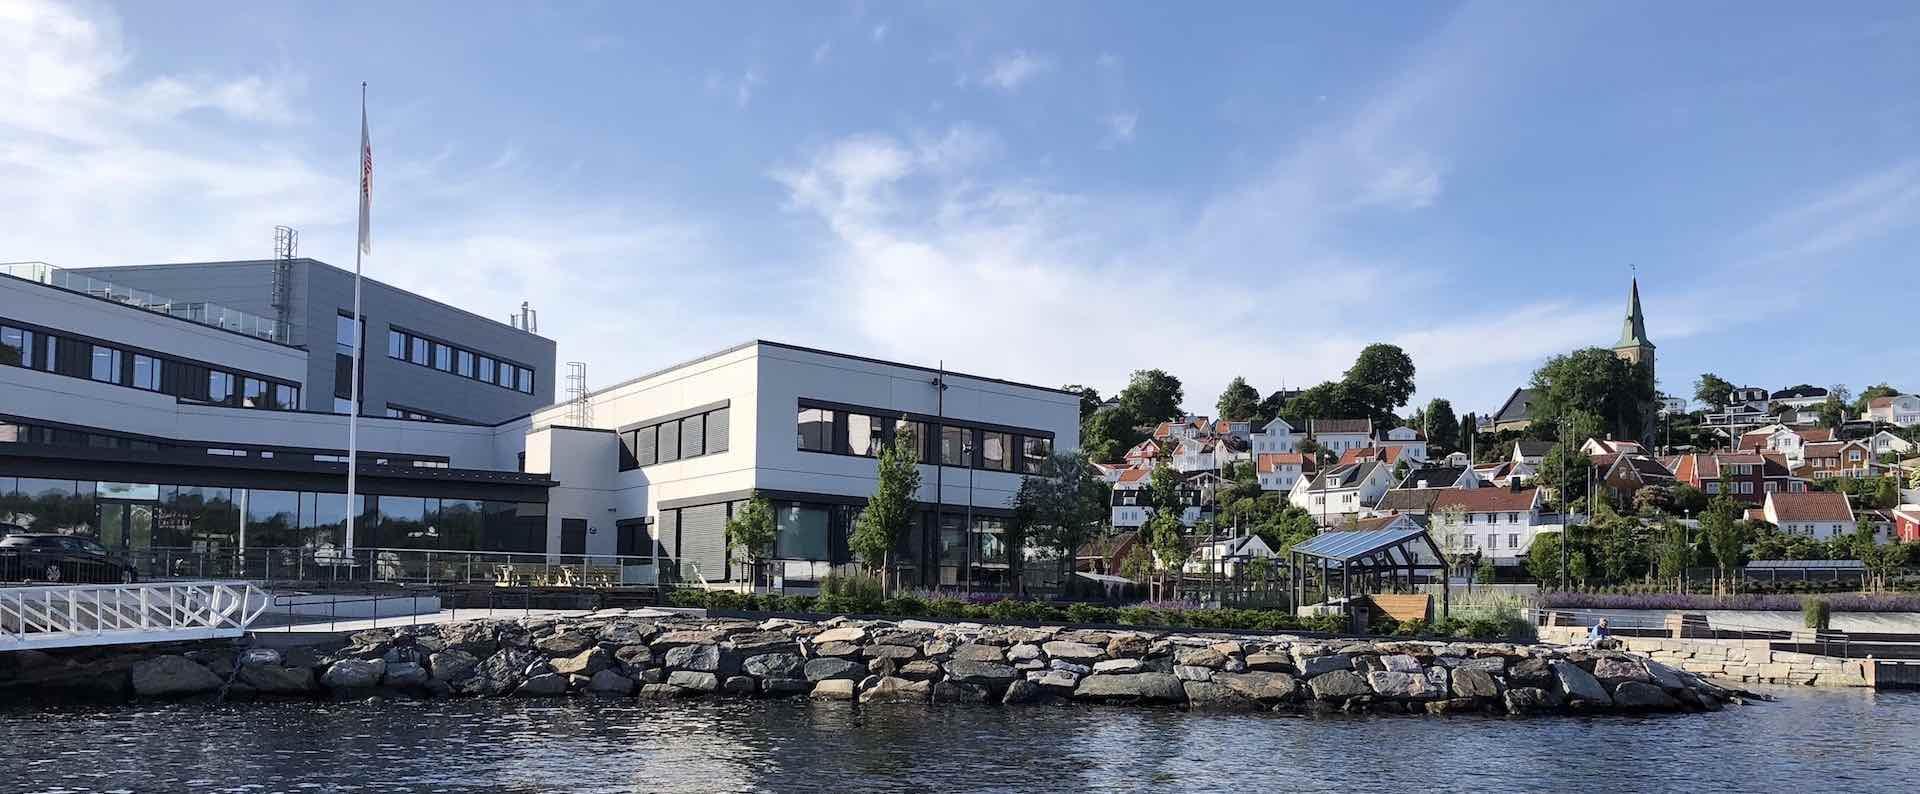 Norac's headquarter in Arendal, Norway